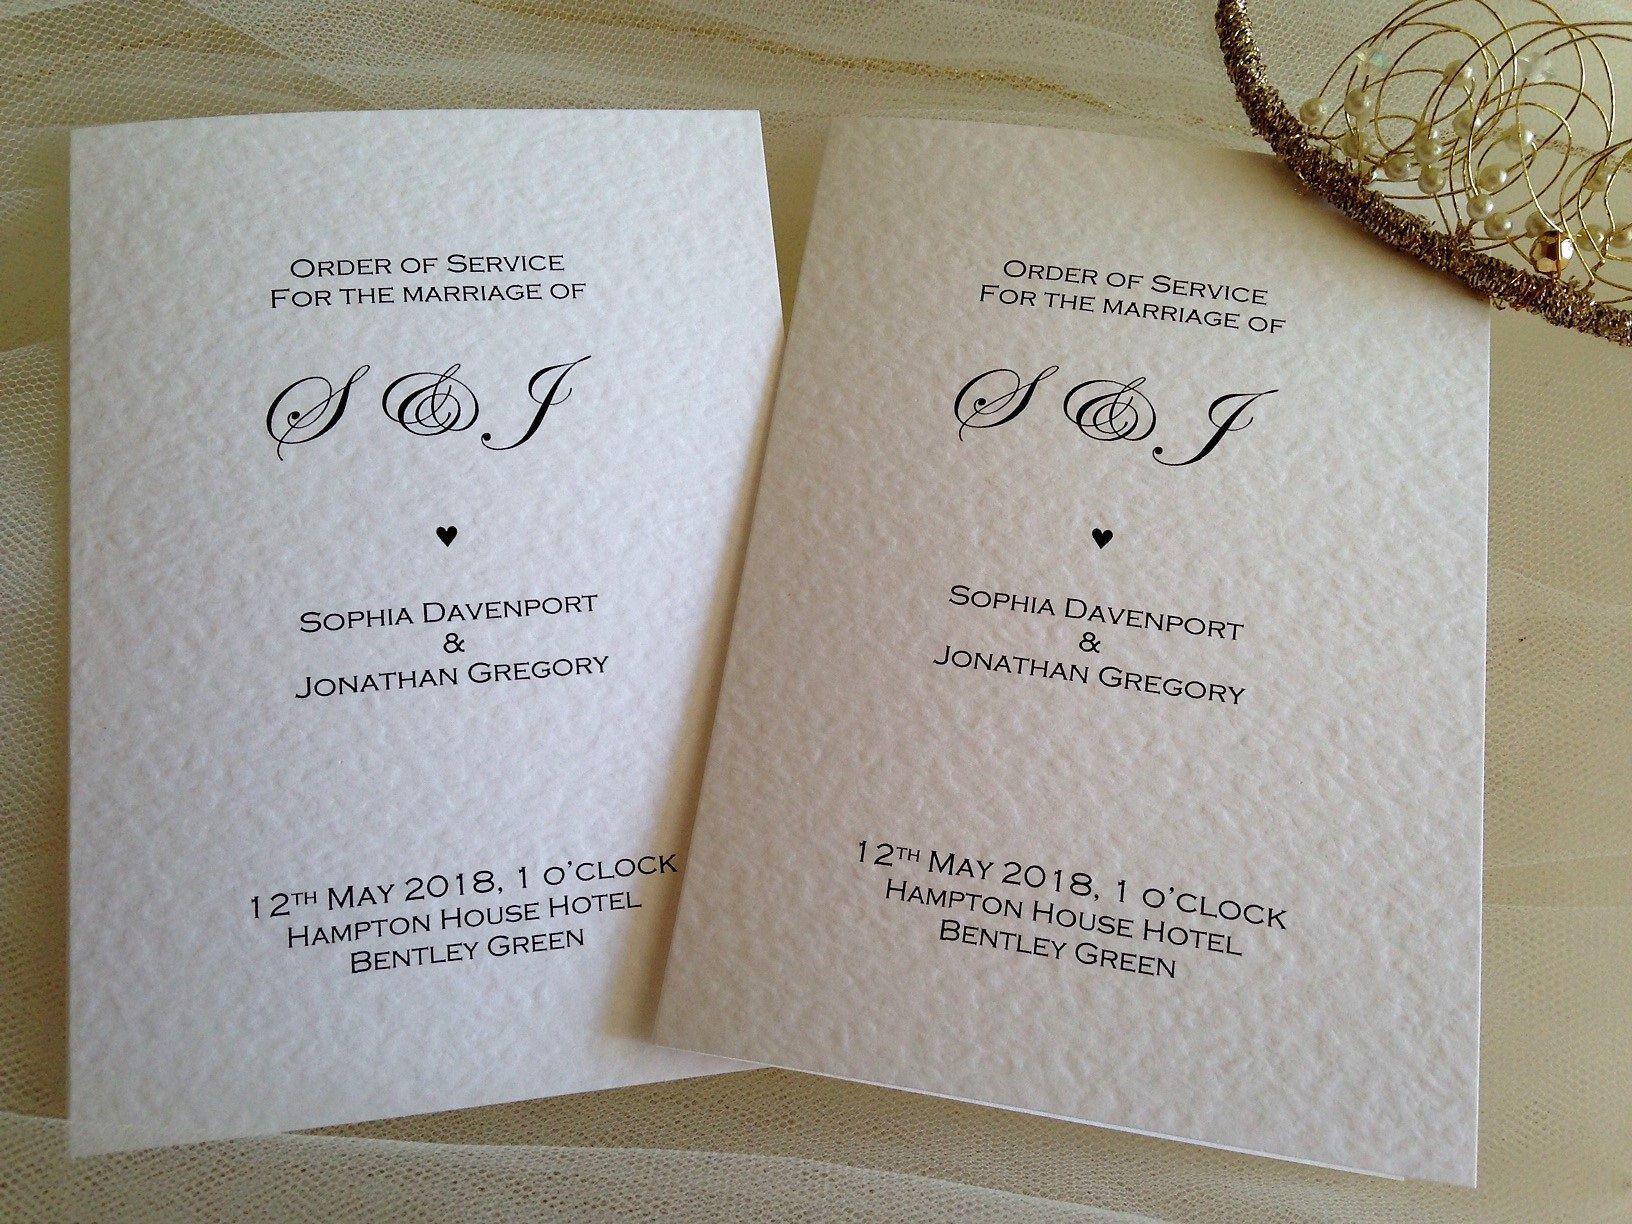 007 Impressive Church Wedding Order Of Service Template Uk Idea Full